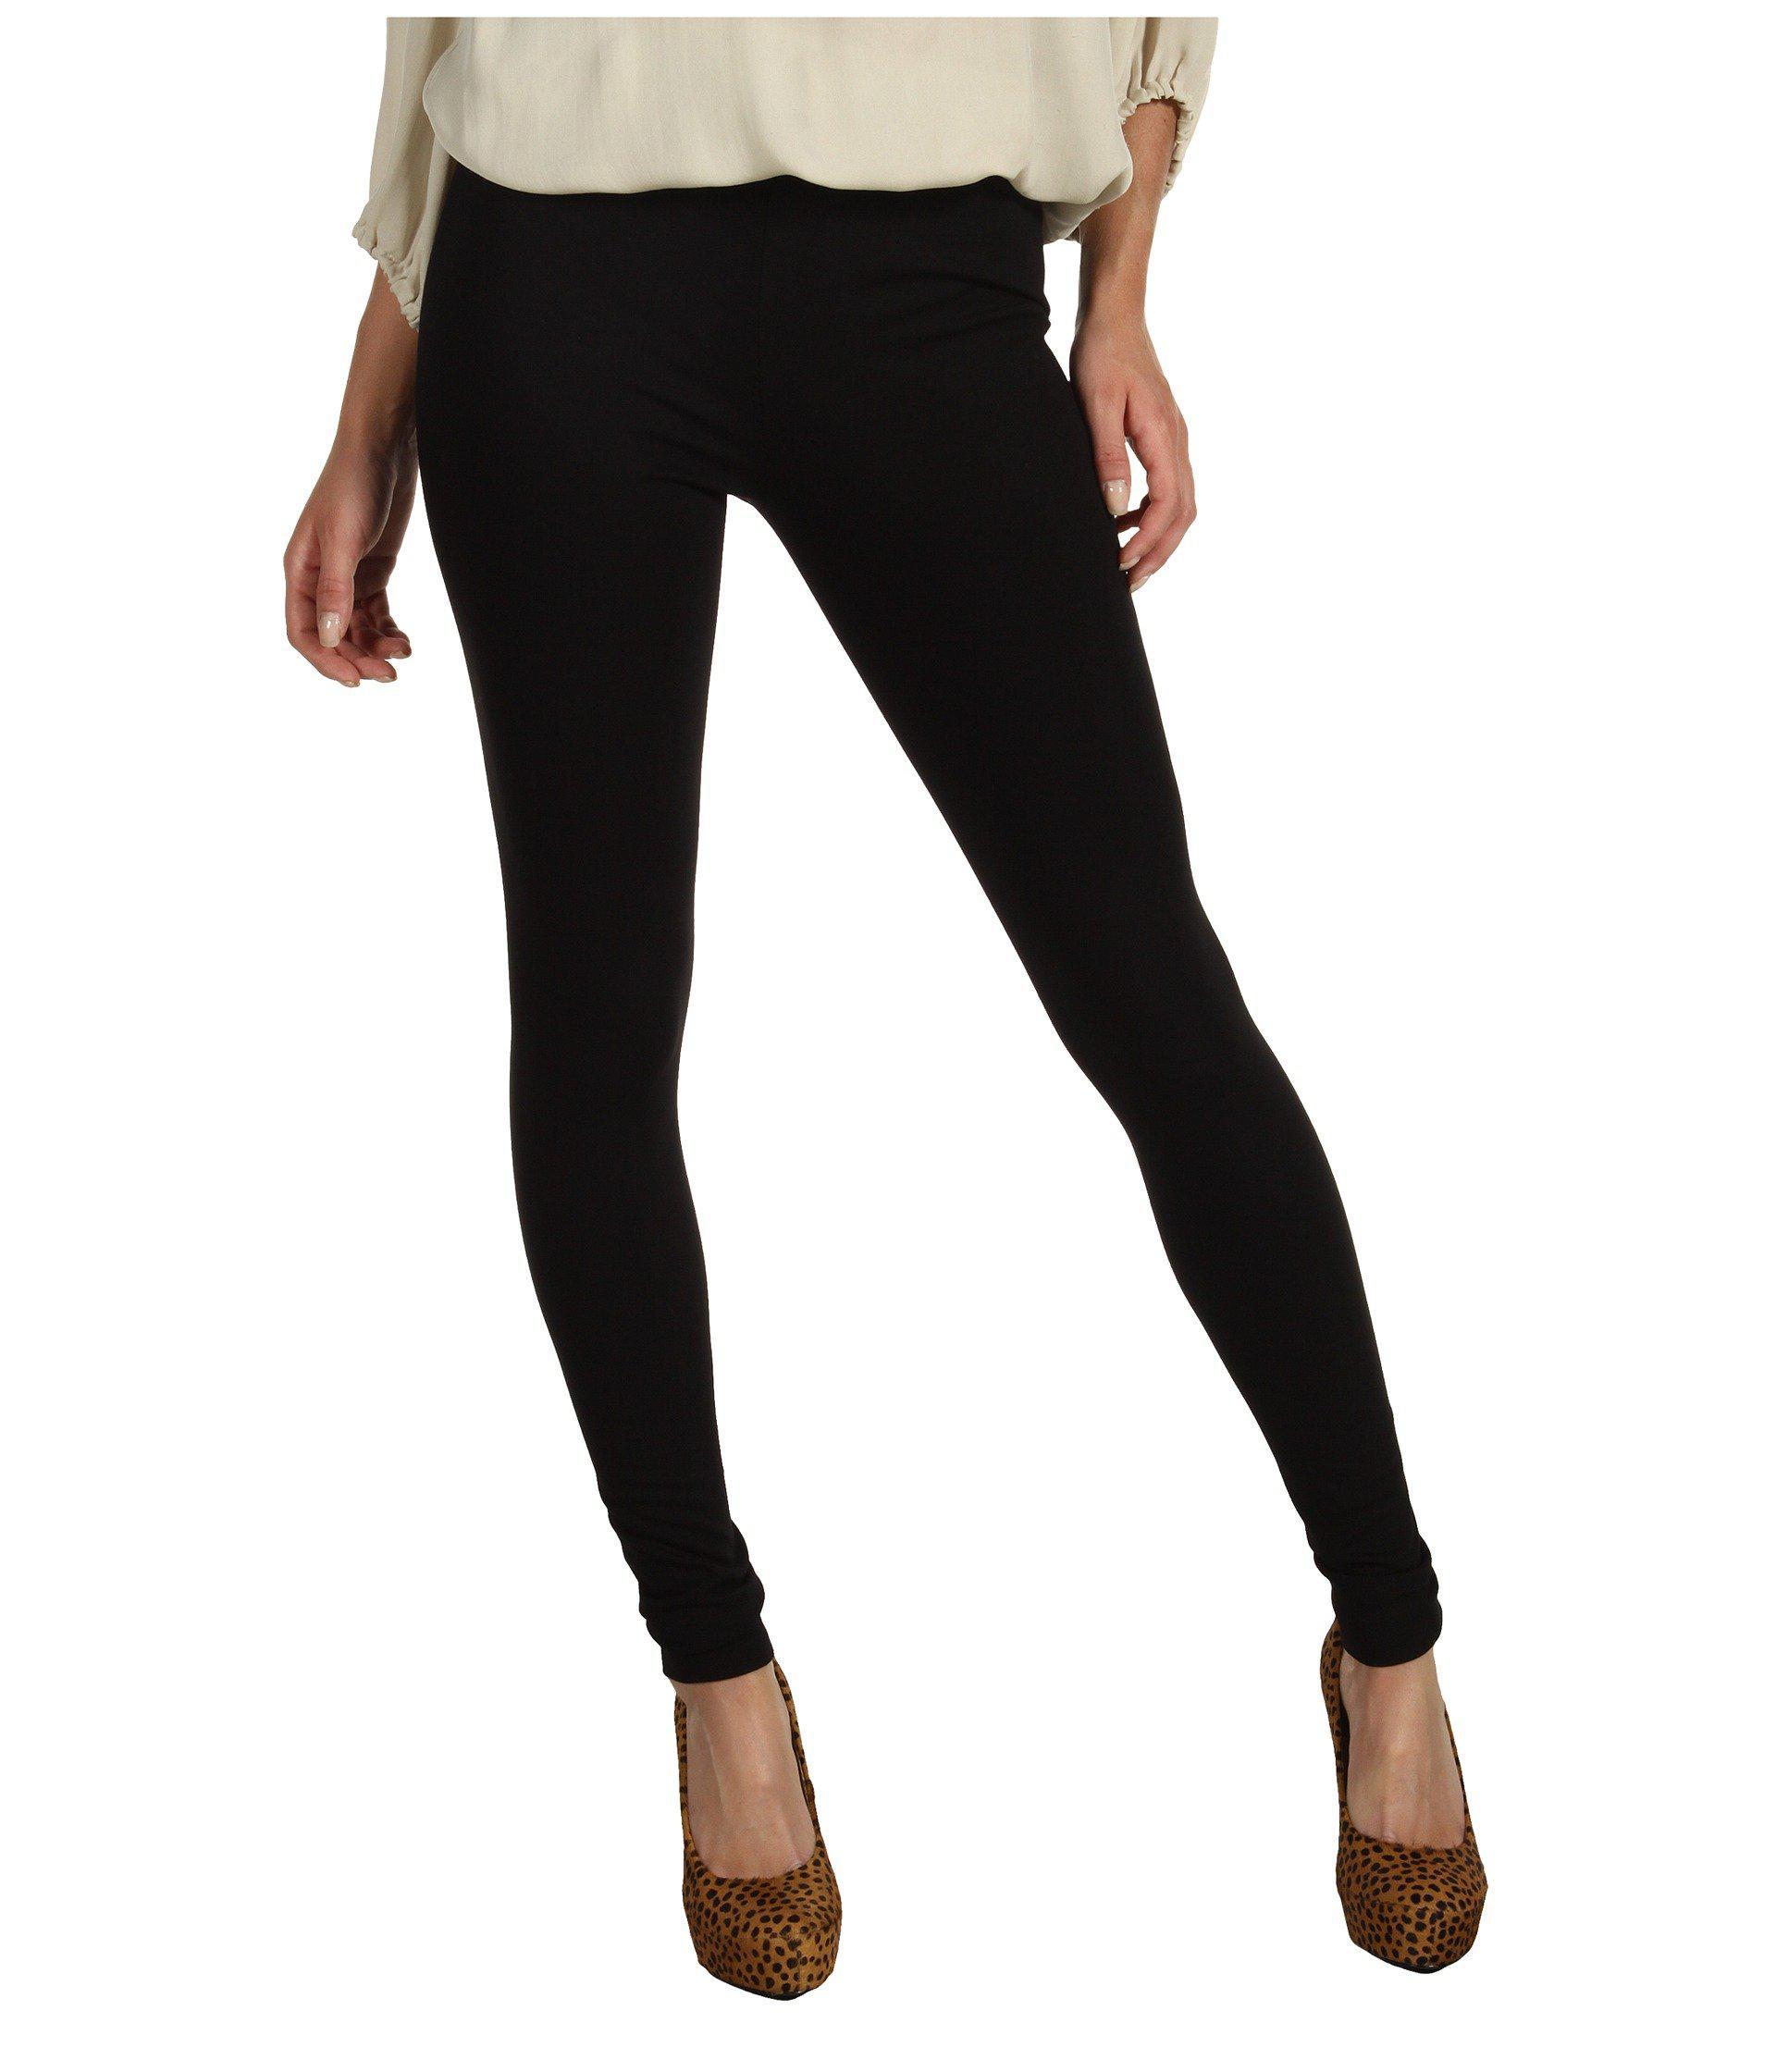 aeb84fe5b6577 Lyst - Vince Camuto Ponte Legging (rich Black) Women's Casual Pants ...